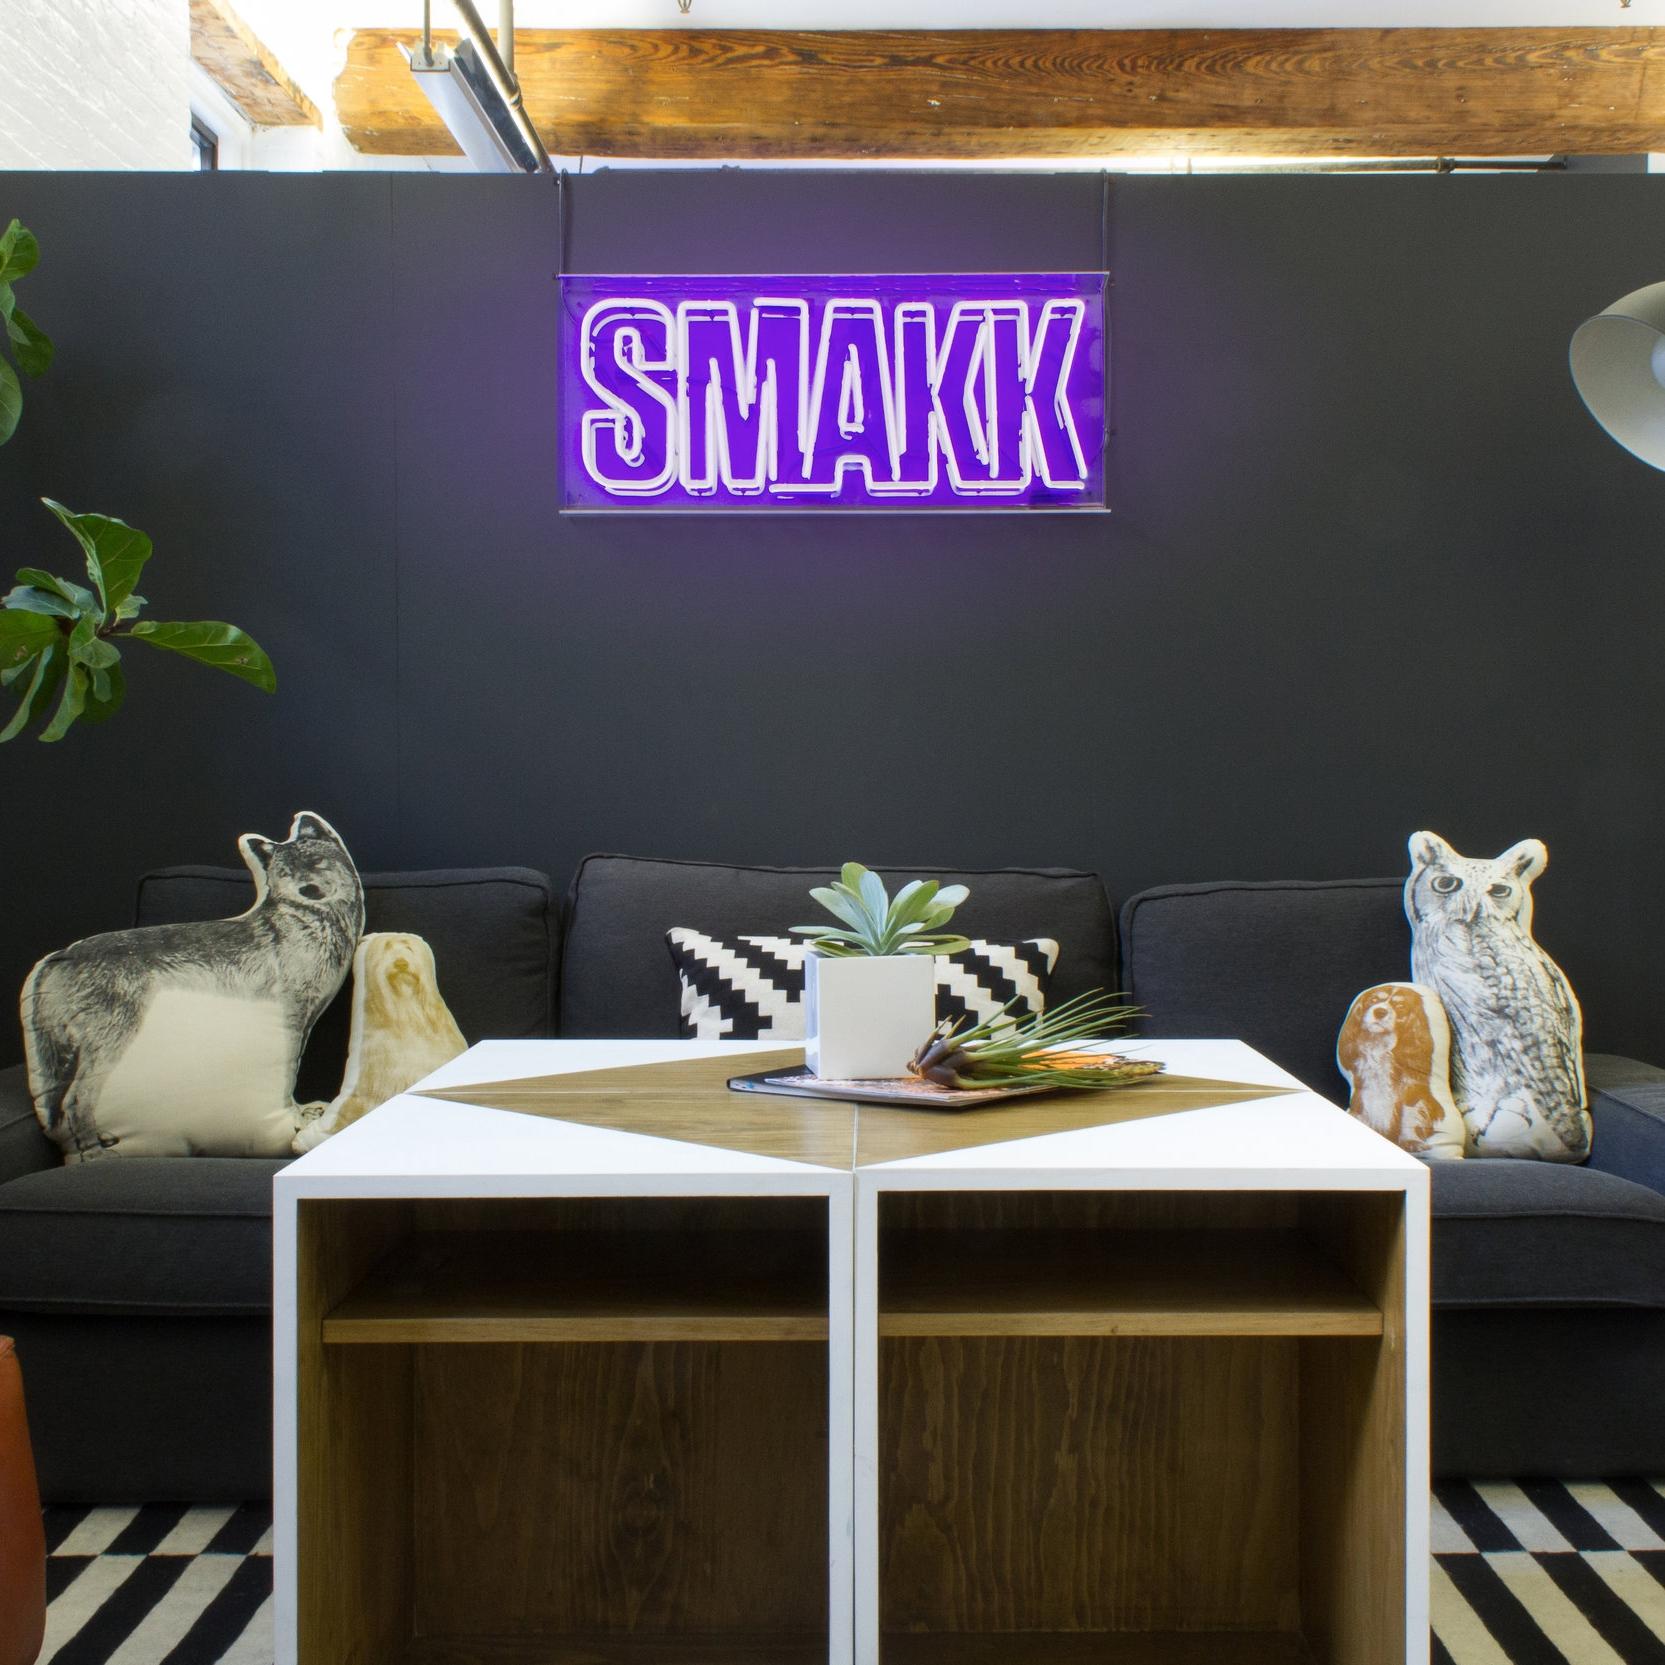 SMAKK - Williamsburg, New York, completed 2016